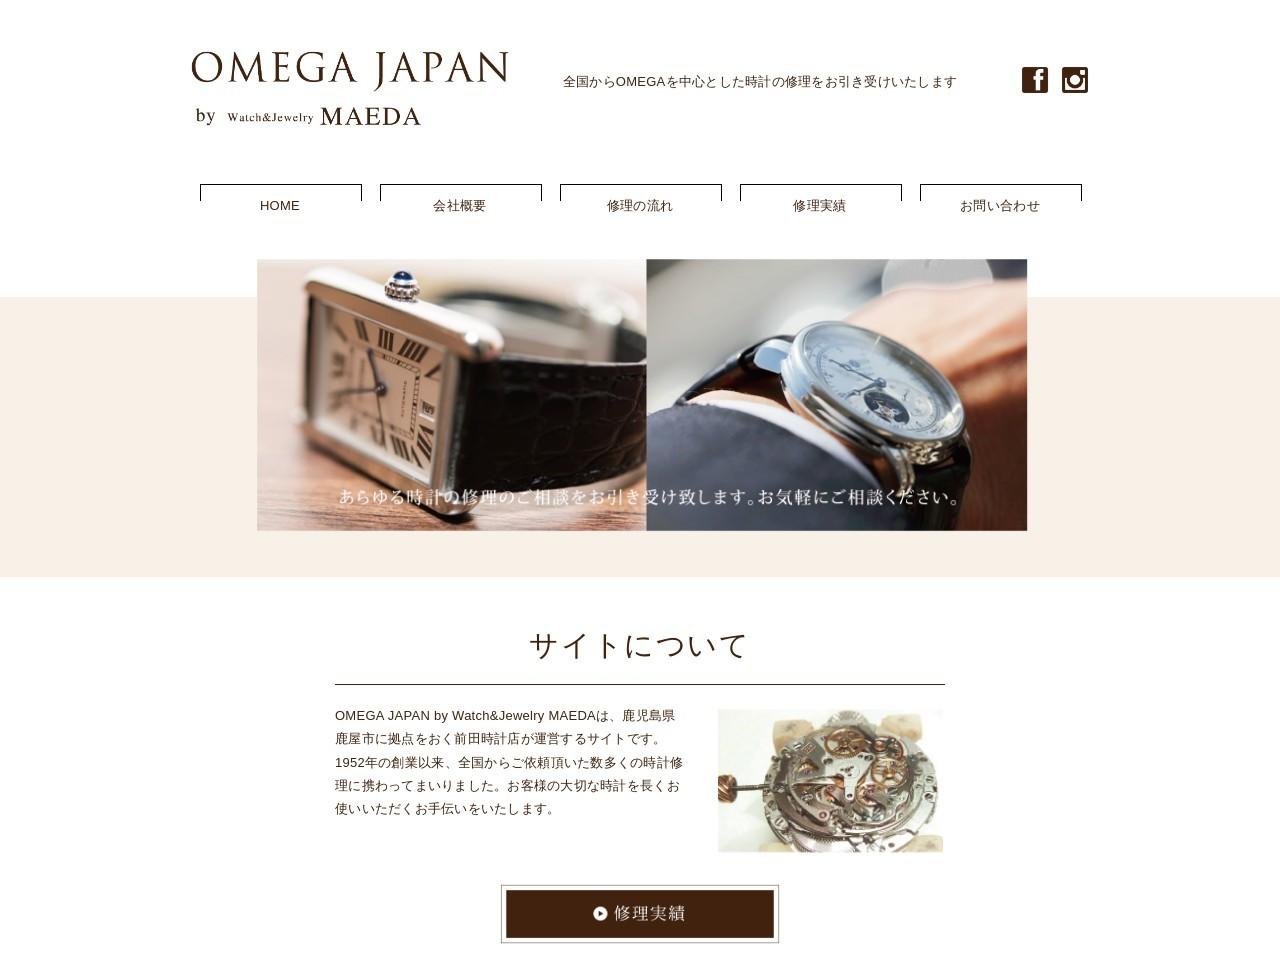 OMEGA JAPAN